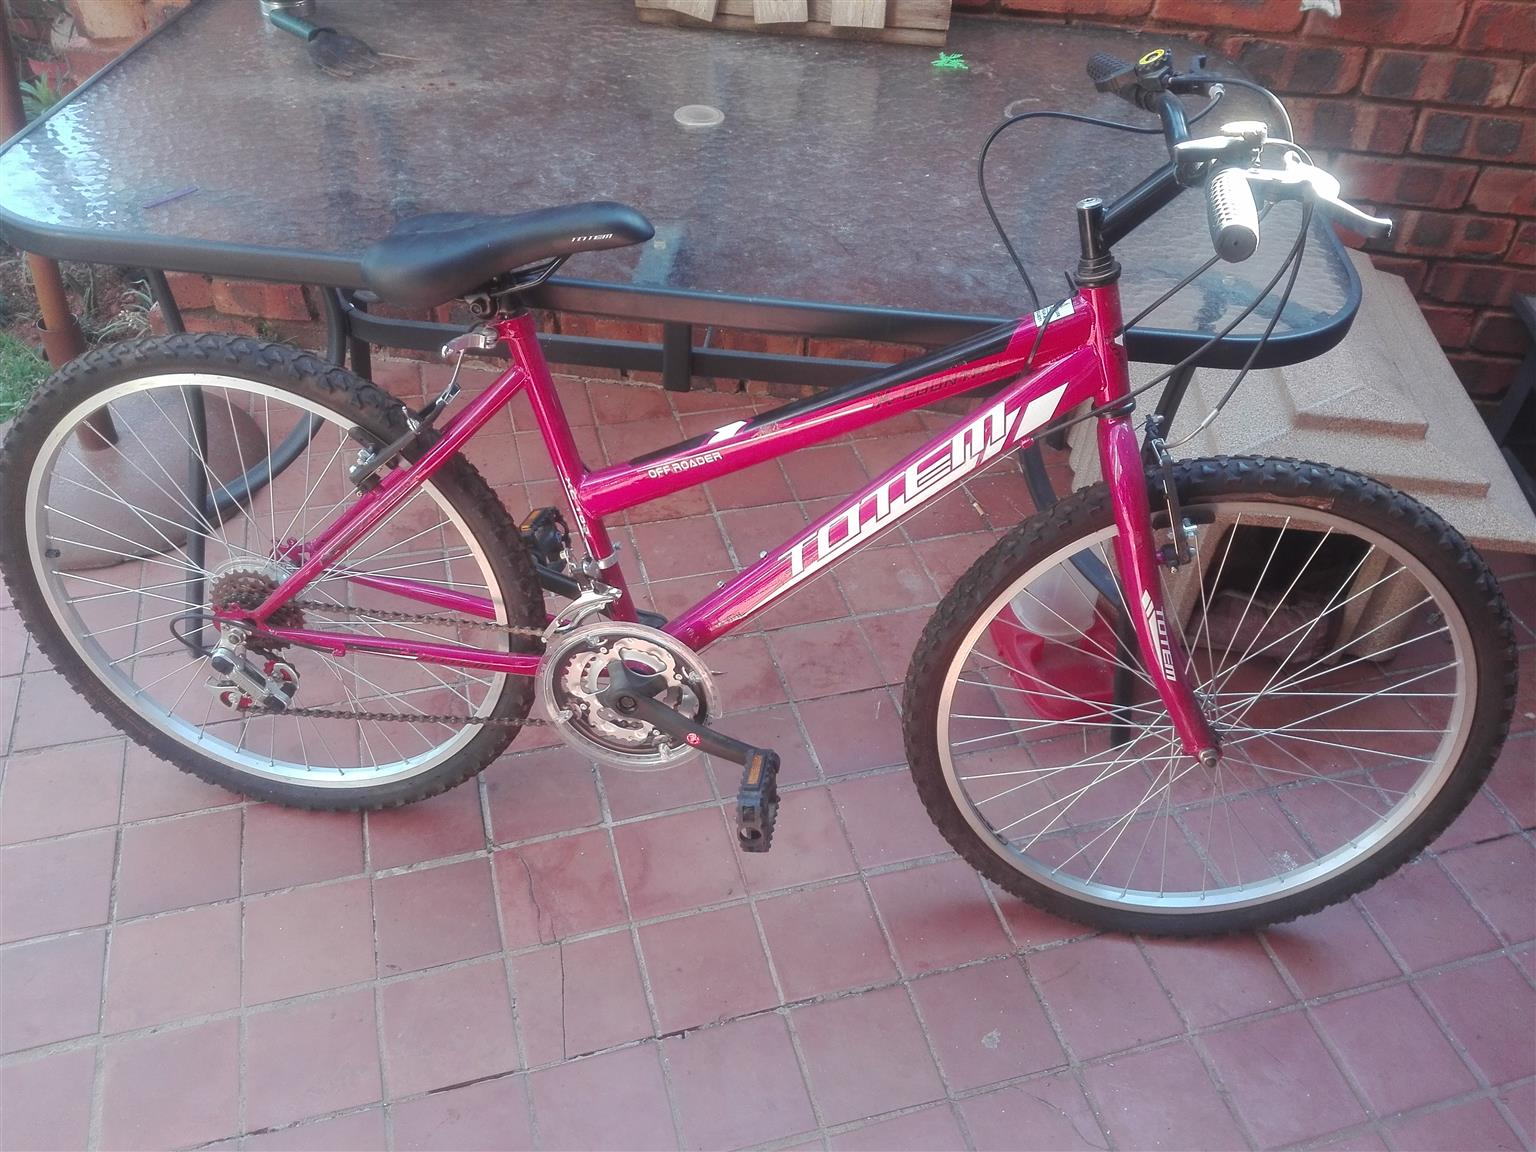 TOTEM OFF ROADER XC 100 LADIES BICYCLE R 800 800 R   Junk Mail 3c5b10